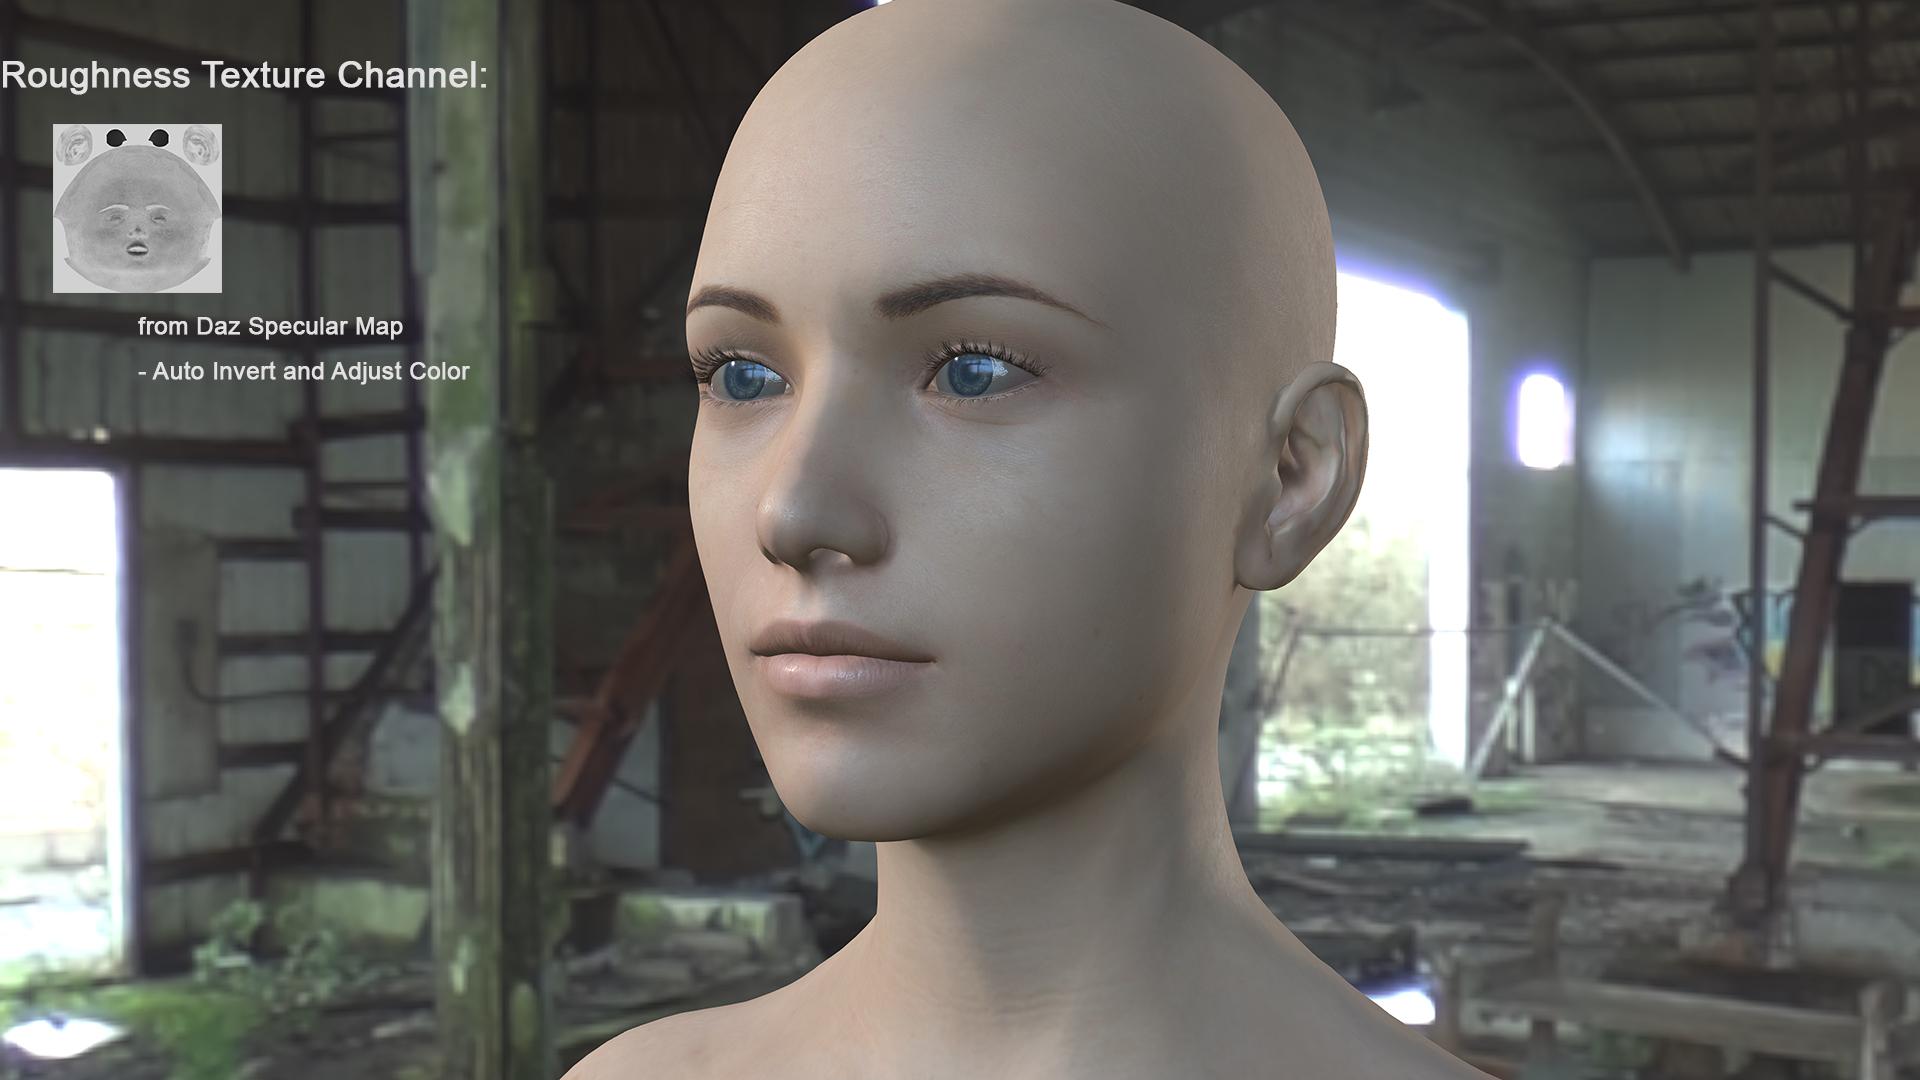 https://forum.reallusion.com/uploads/images/97b617b3-551e-4351-bcee-def9.jpg